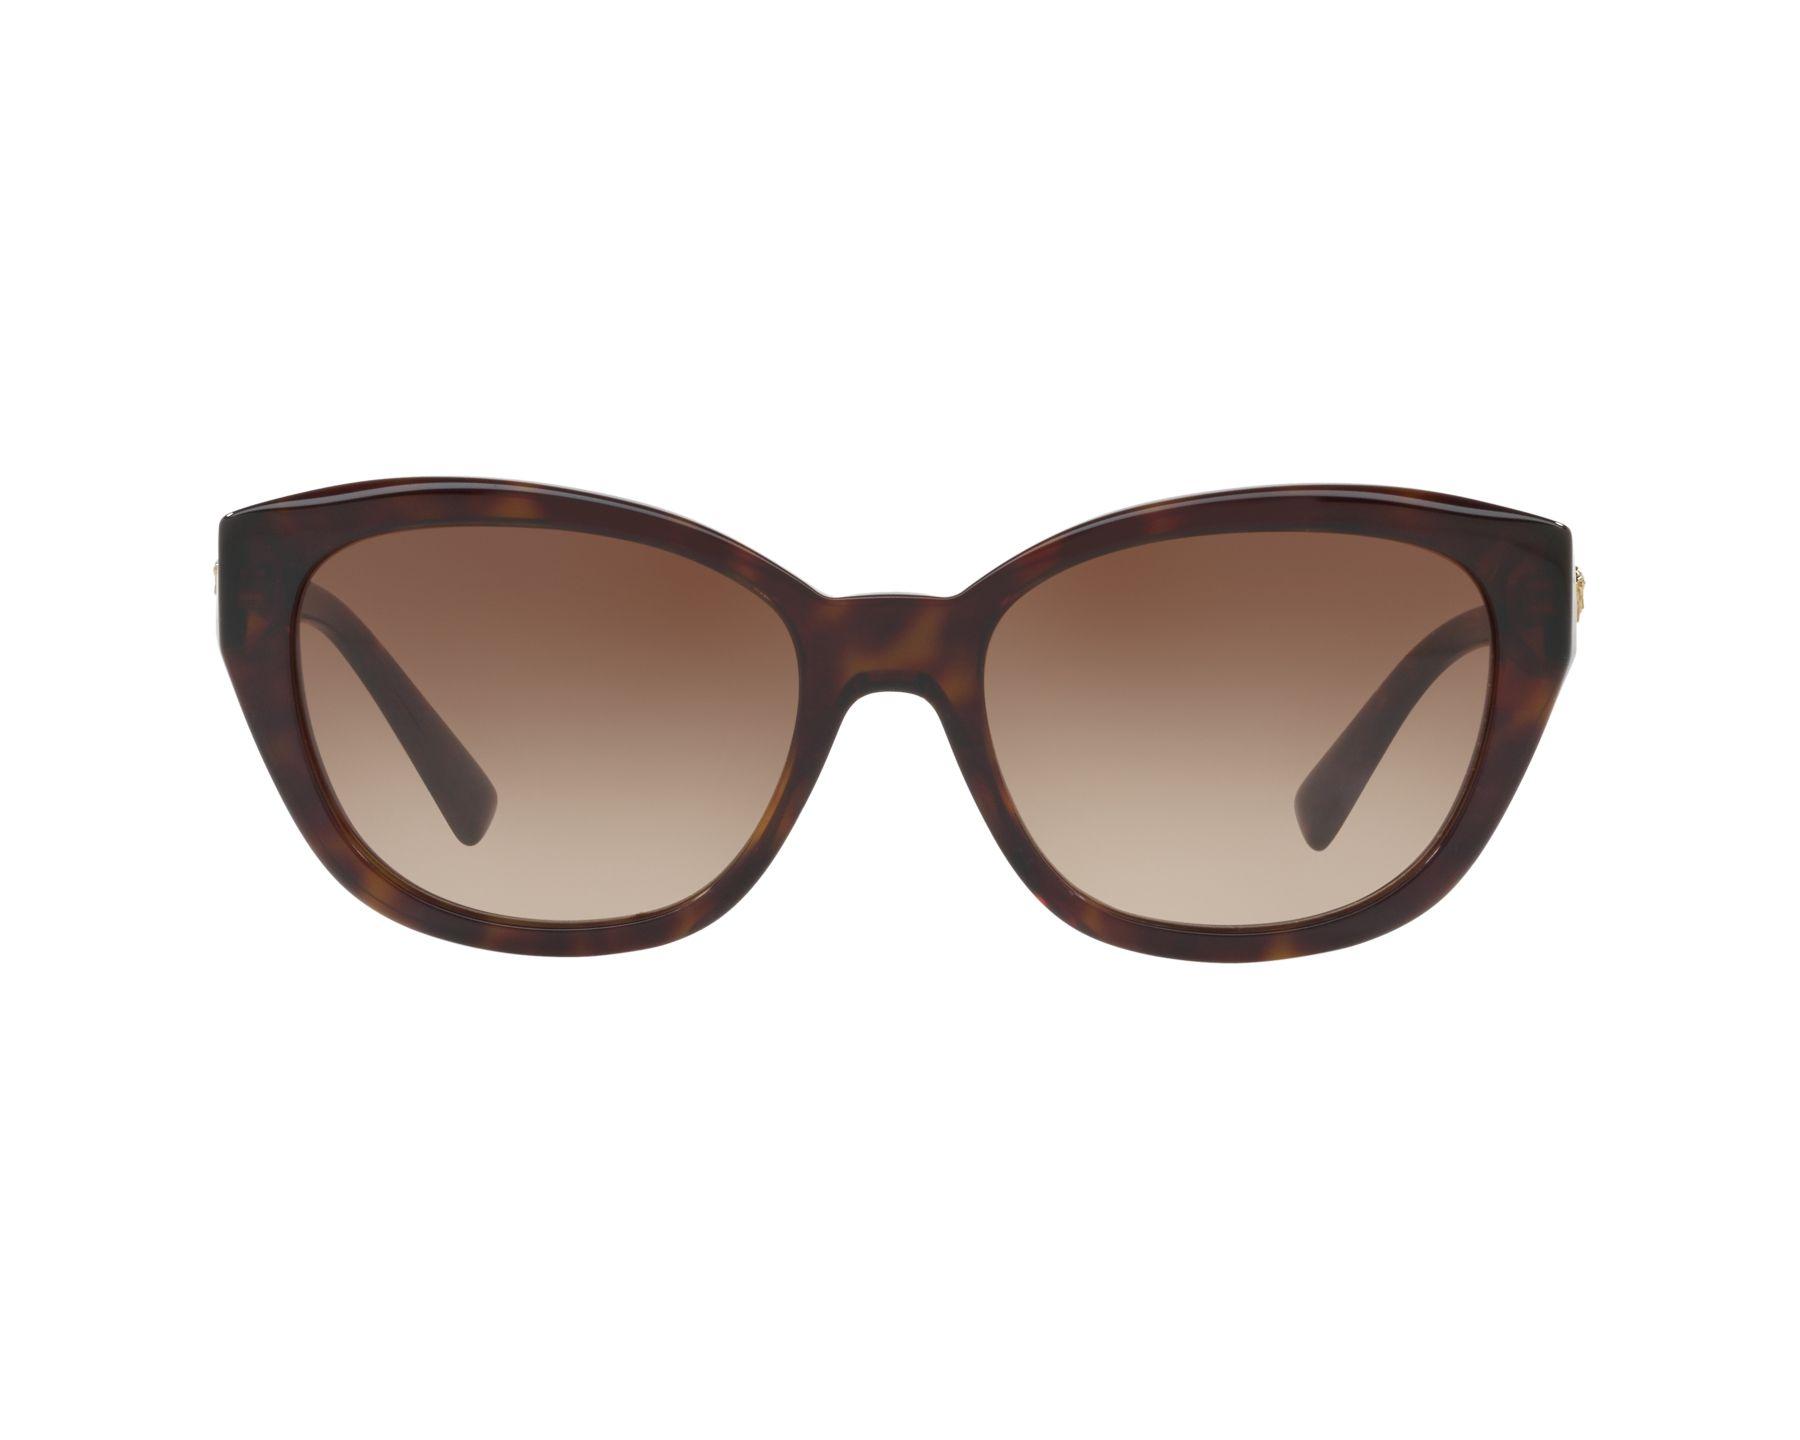 Versace Sunglasses Havana with Brown Lenses VE-4343 108/13 - Visionet US